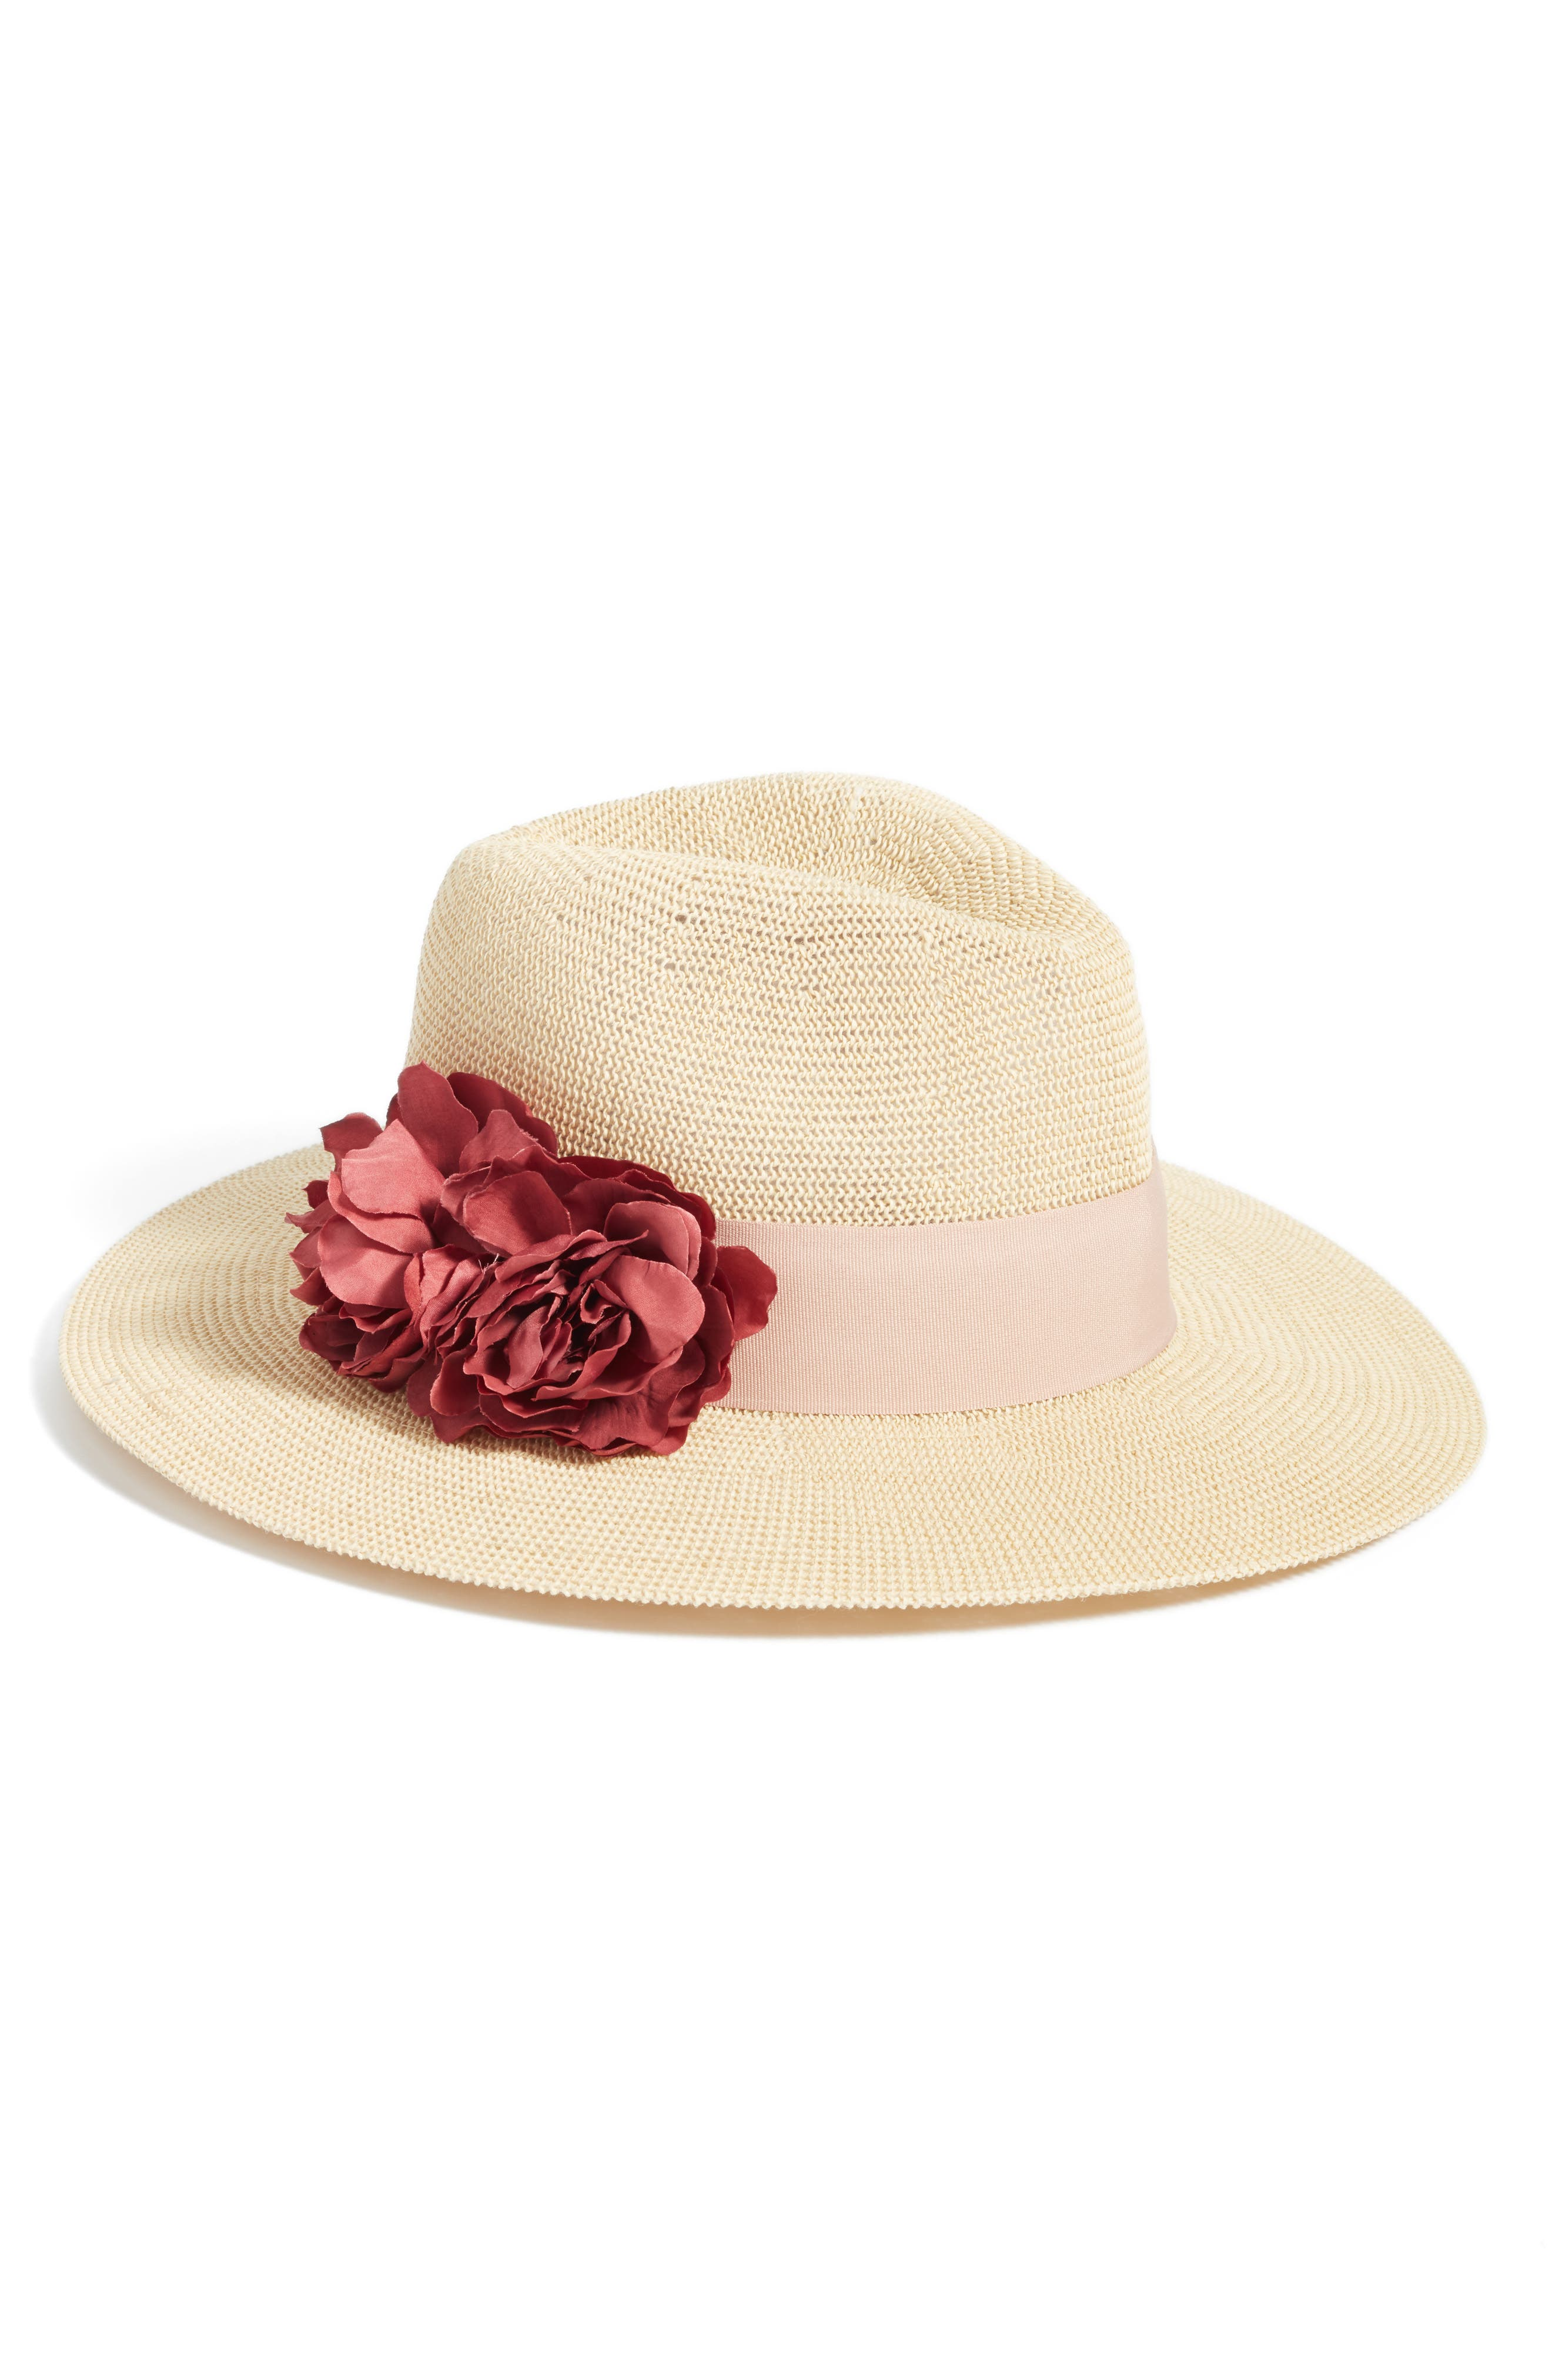 Floral Trim Straw Panama Hat,                             Main thumbnail 1, color,                             Natural